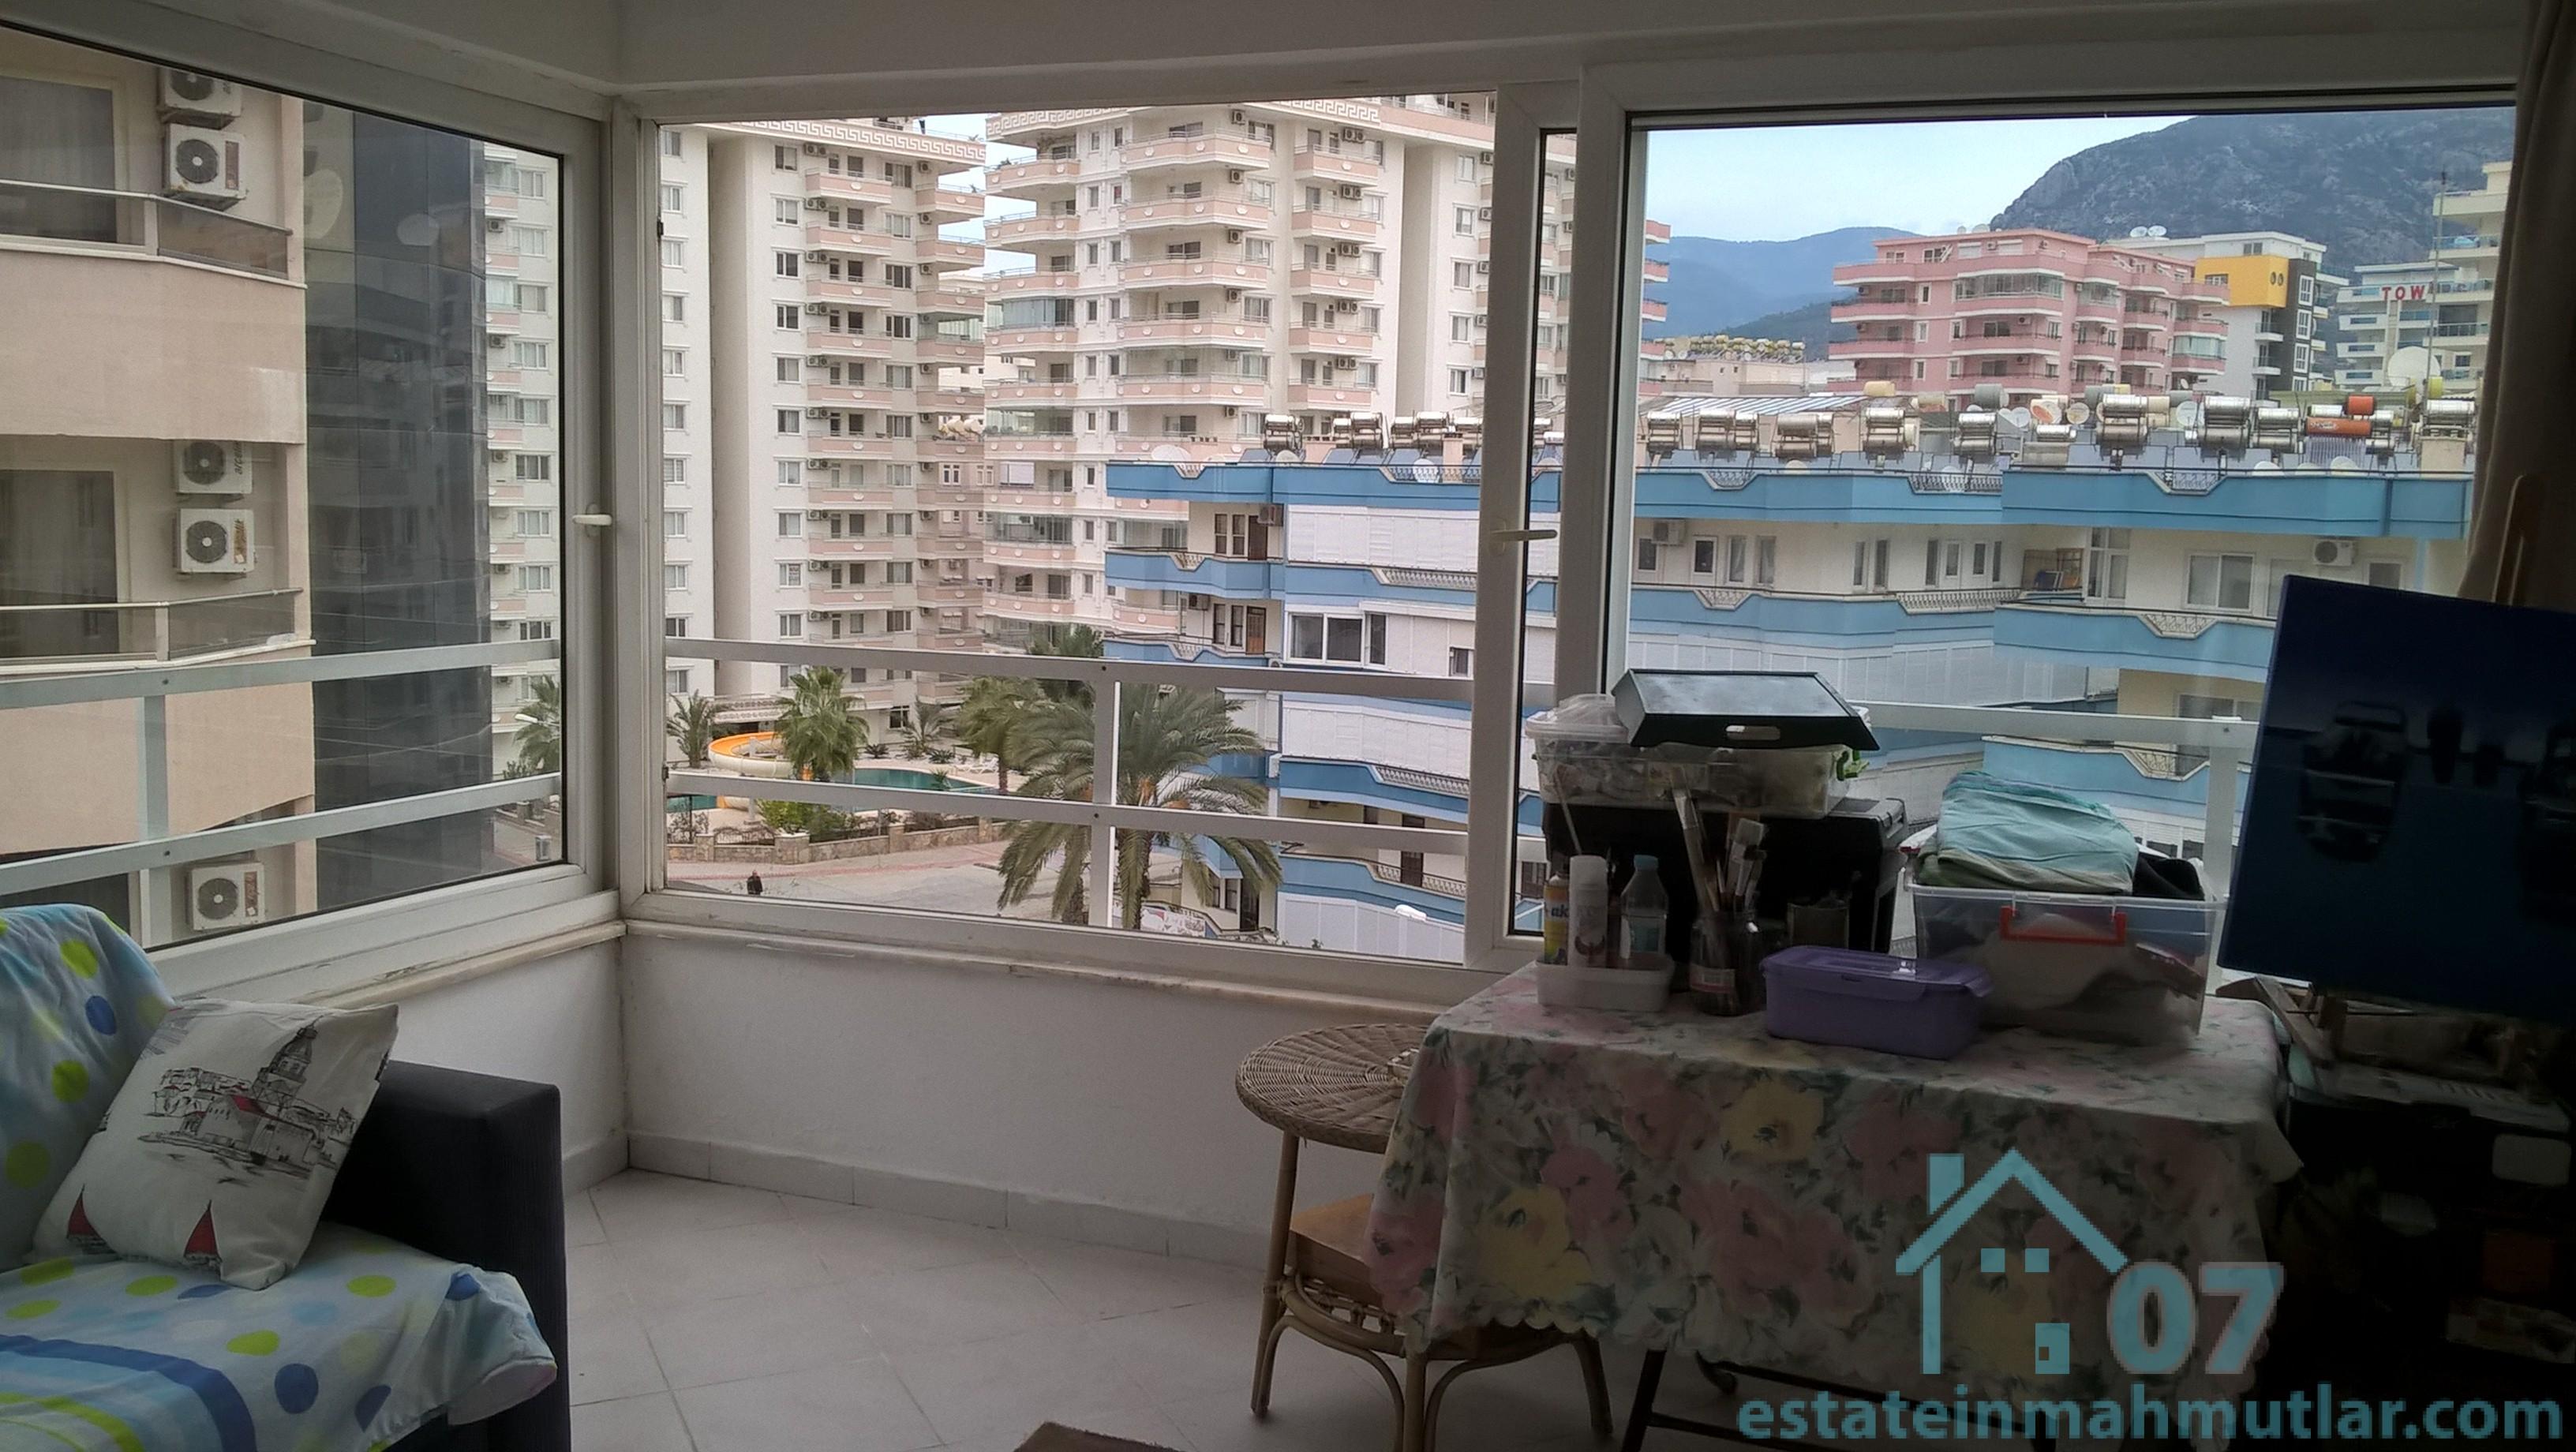 One Bedroom Seaside Apartment with a Private Beach in Mahmutlar, Alanya Antalya